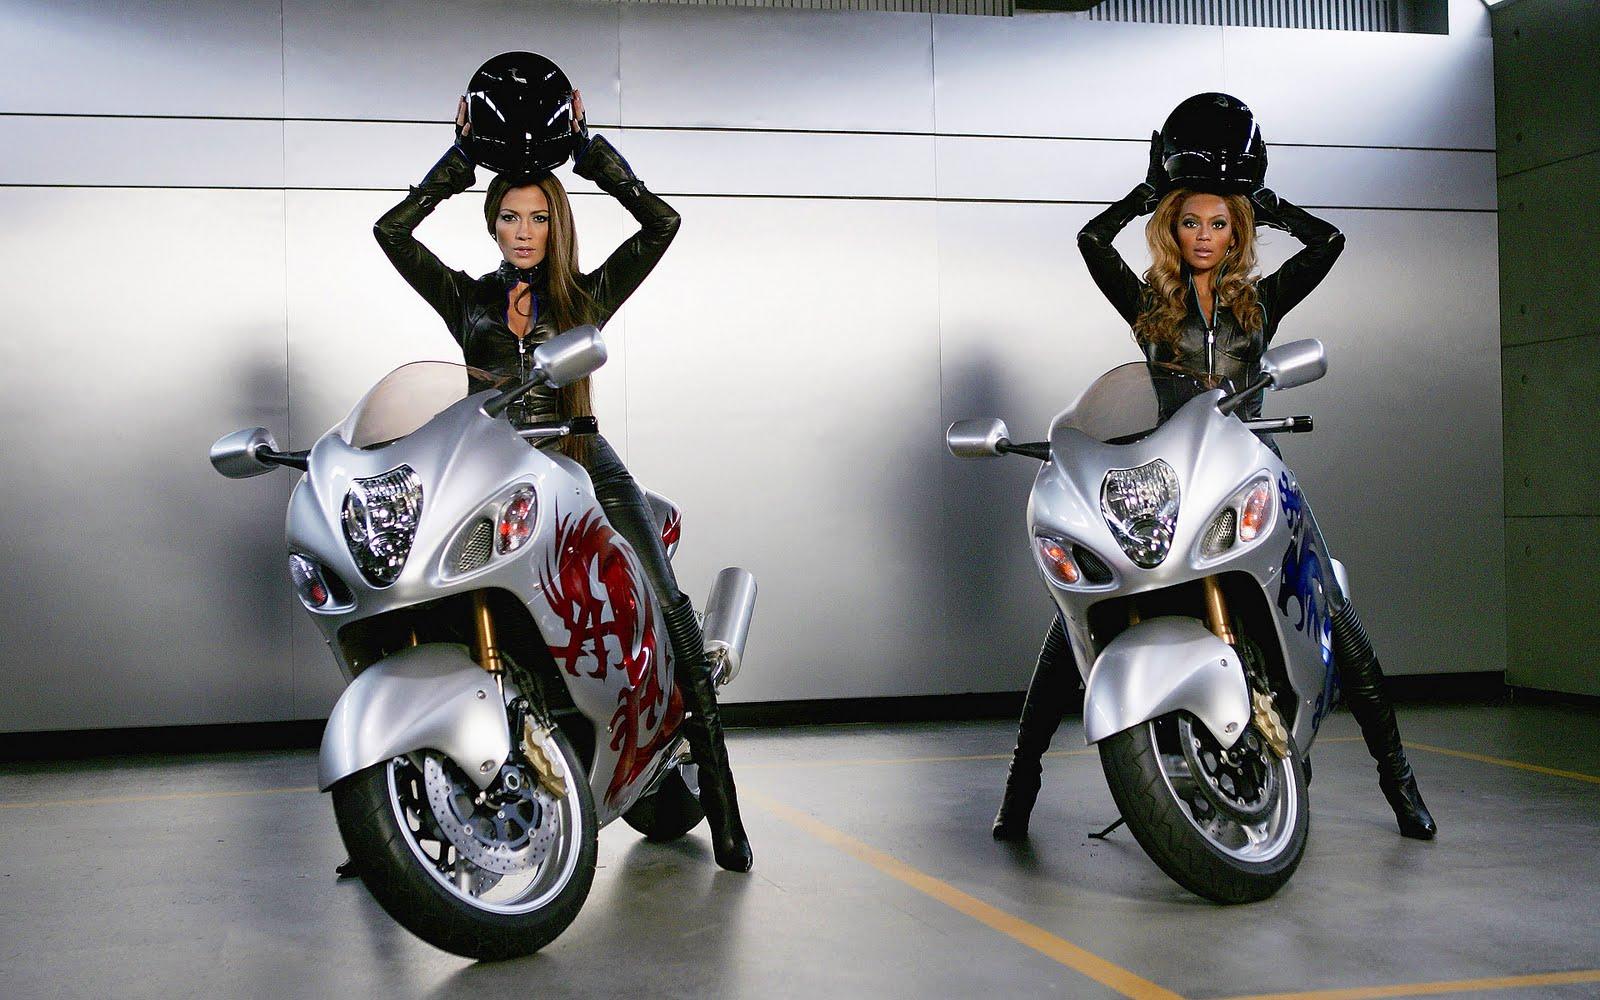 Best Top Desktop Motorcycles Wallpapers Hd Beautiful Motorcycle 1600x1000